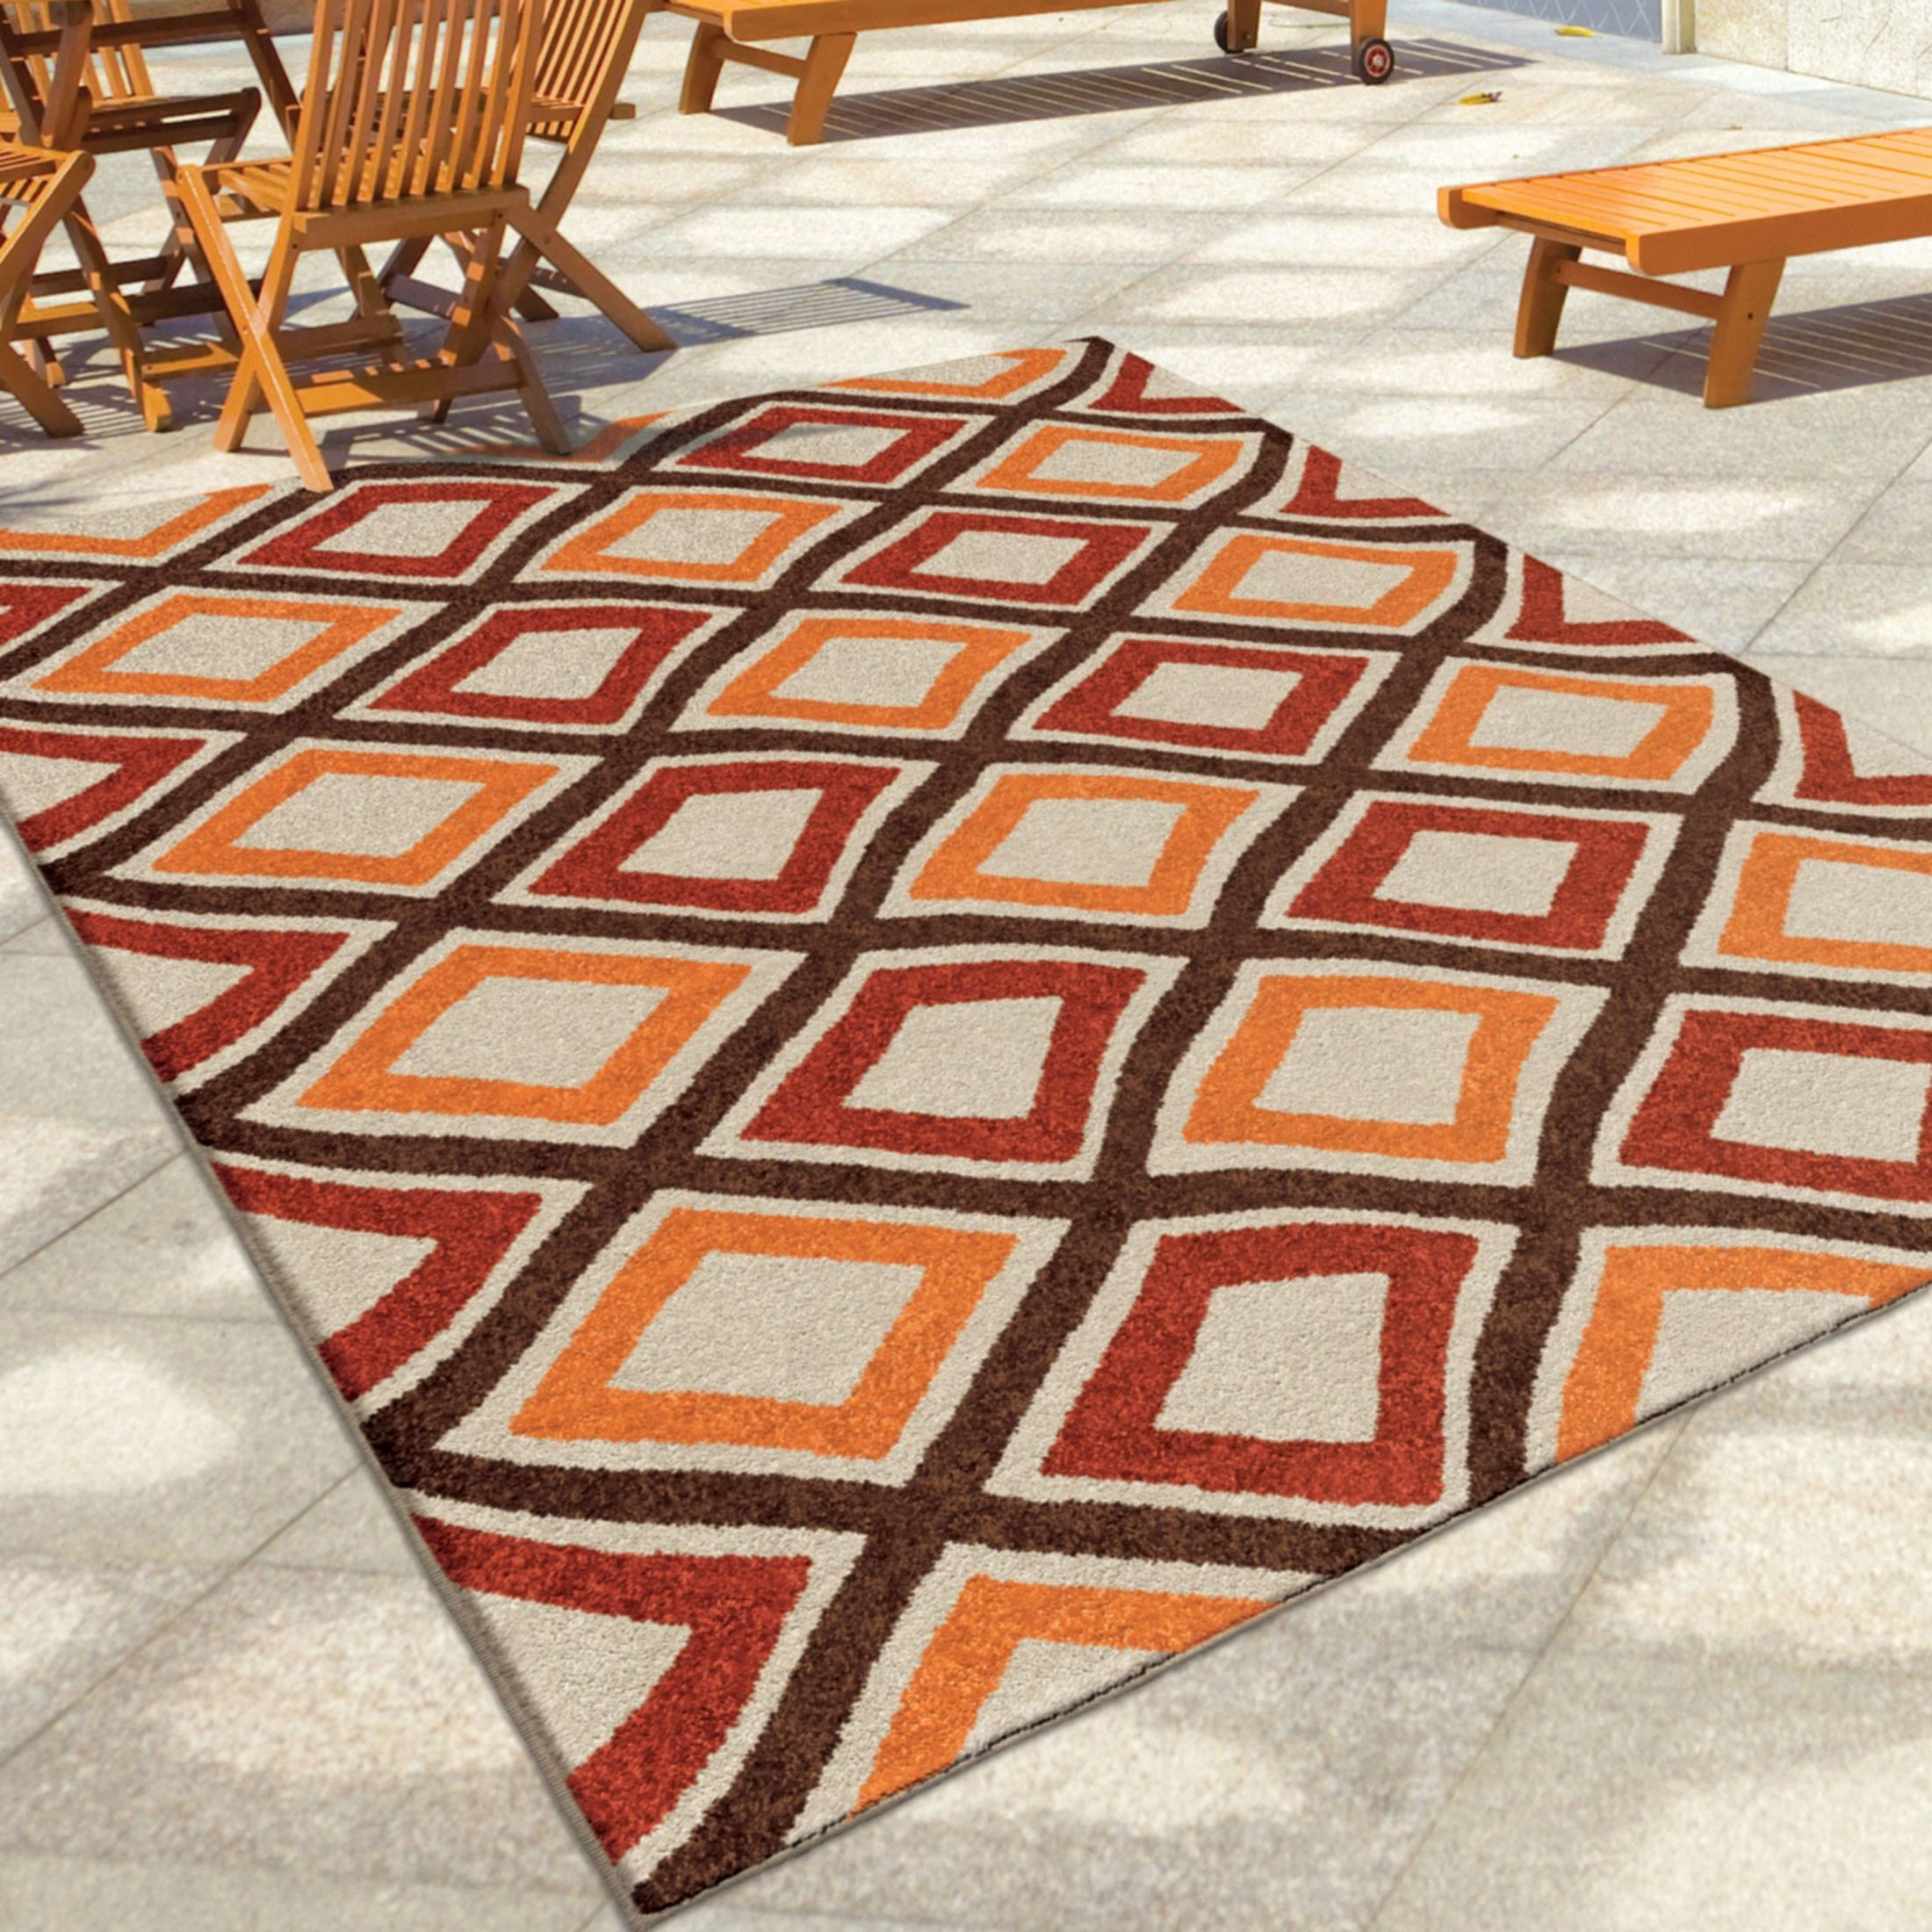 Outdoor 5x8 Area Rug: Orian Rugs Indoor/Outdoor Squares Broad Street Multi Area